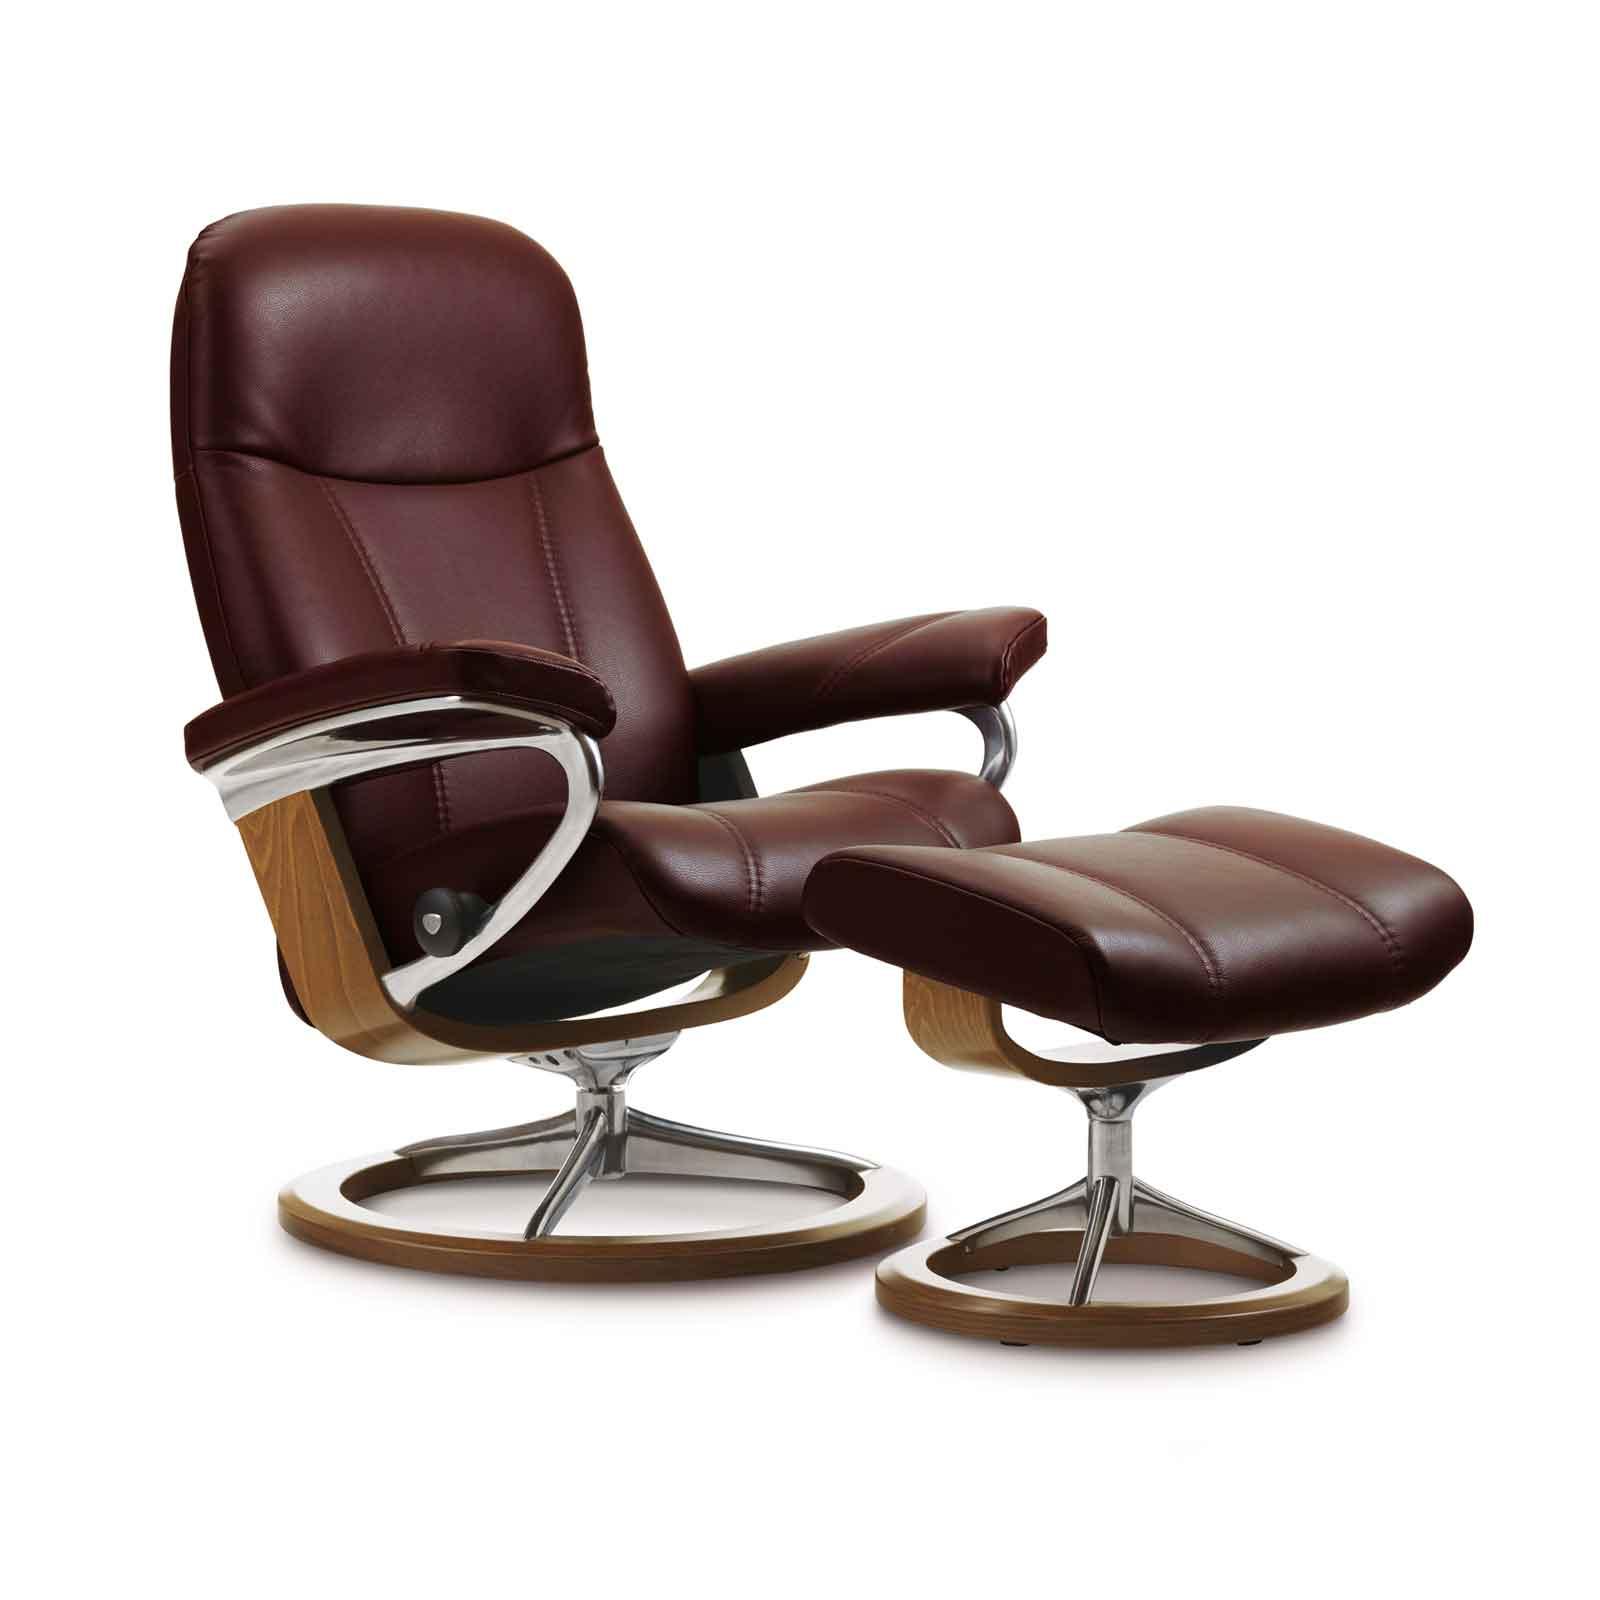 stressless sessel consul burgundy house of comfort. Black Bedroom Furniture Sets. Home Design Ideas